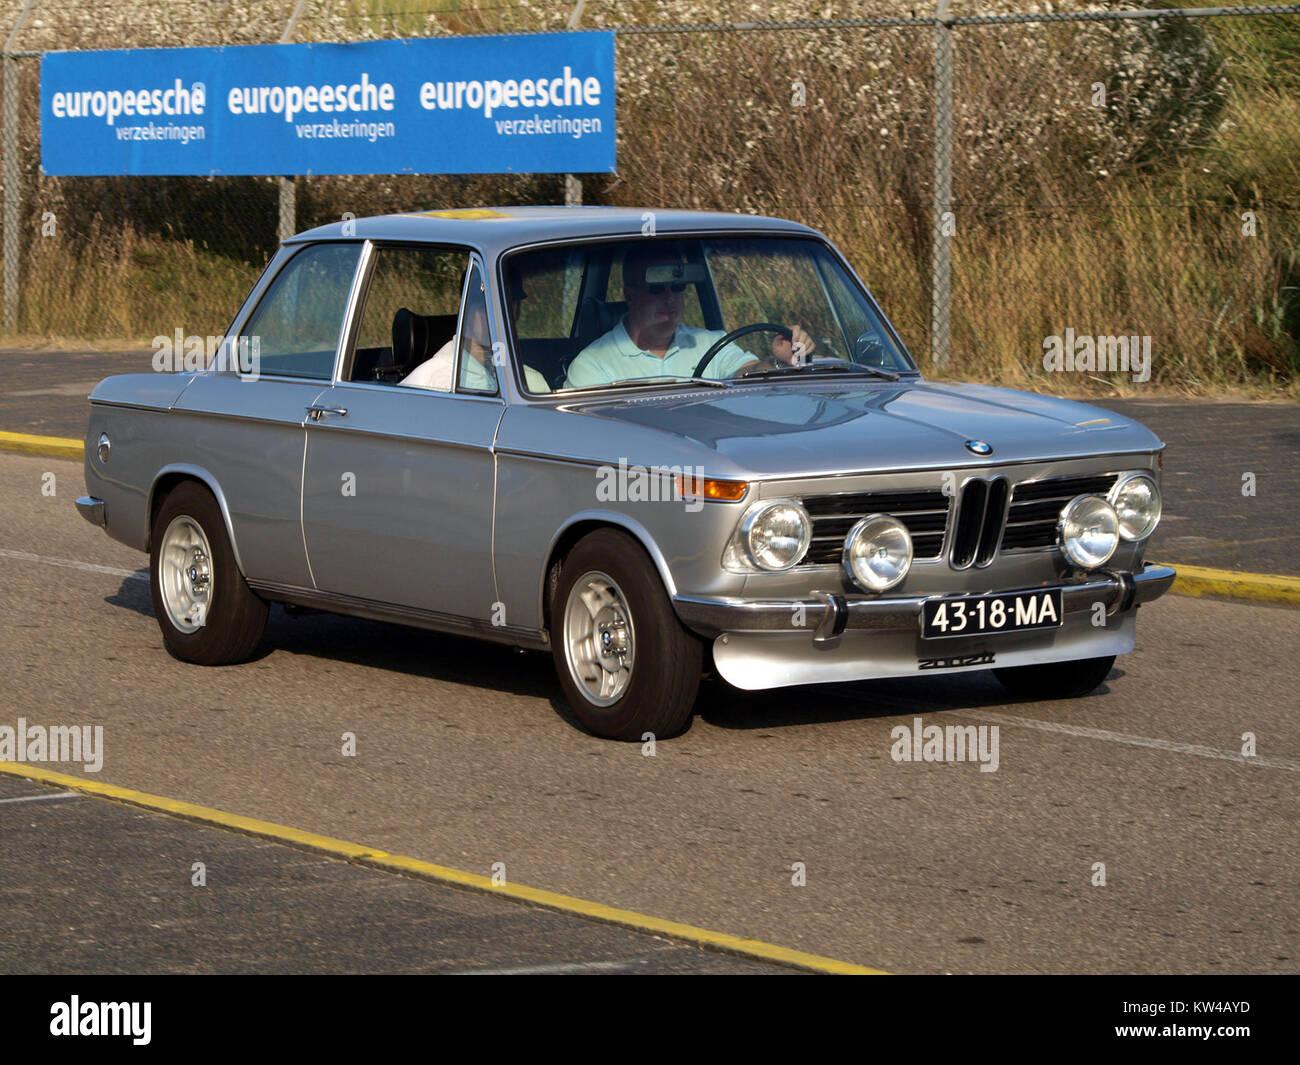 BMW 2002 TI dutch licence registration 43 18 MA pic1 Stock Photo ...